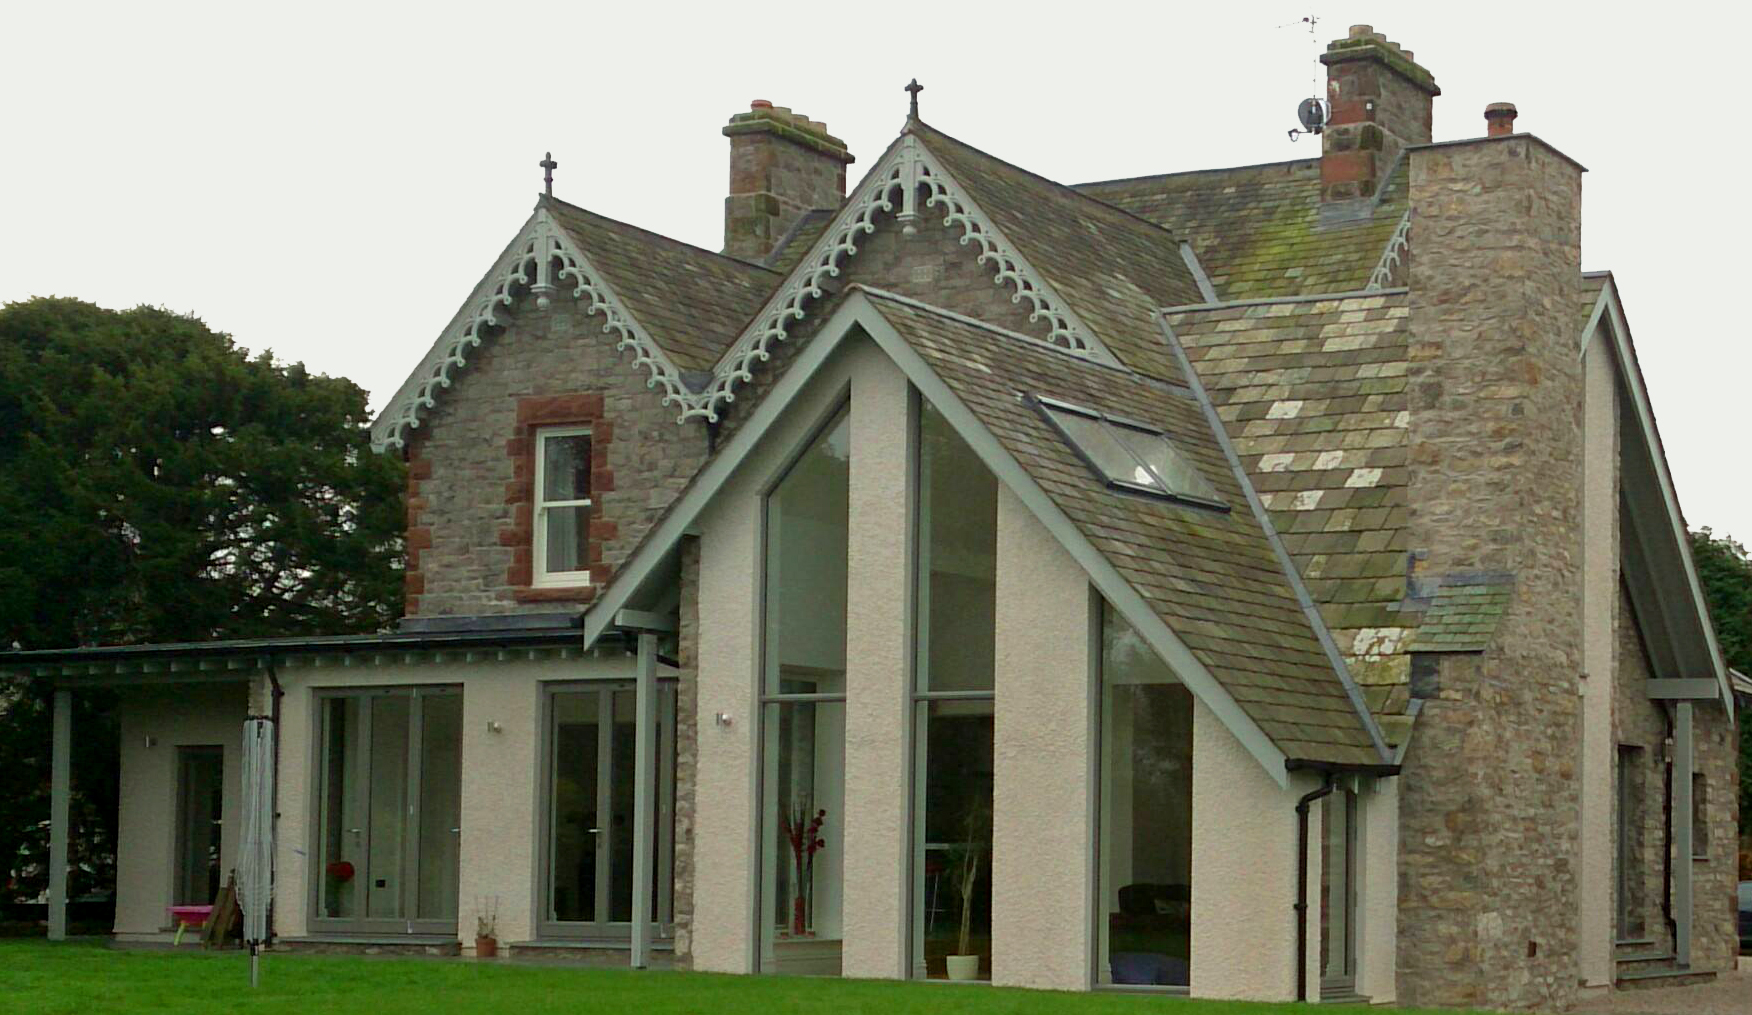 tilt and turn windows from AJ&D Chapelhow (Cliburn) Ltd